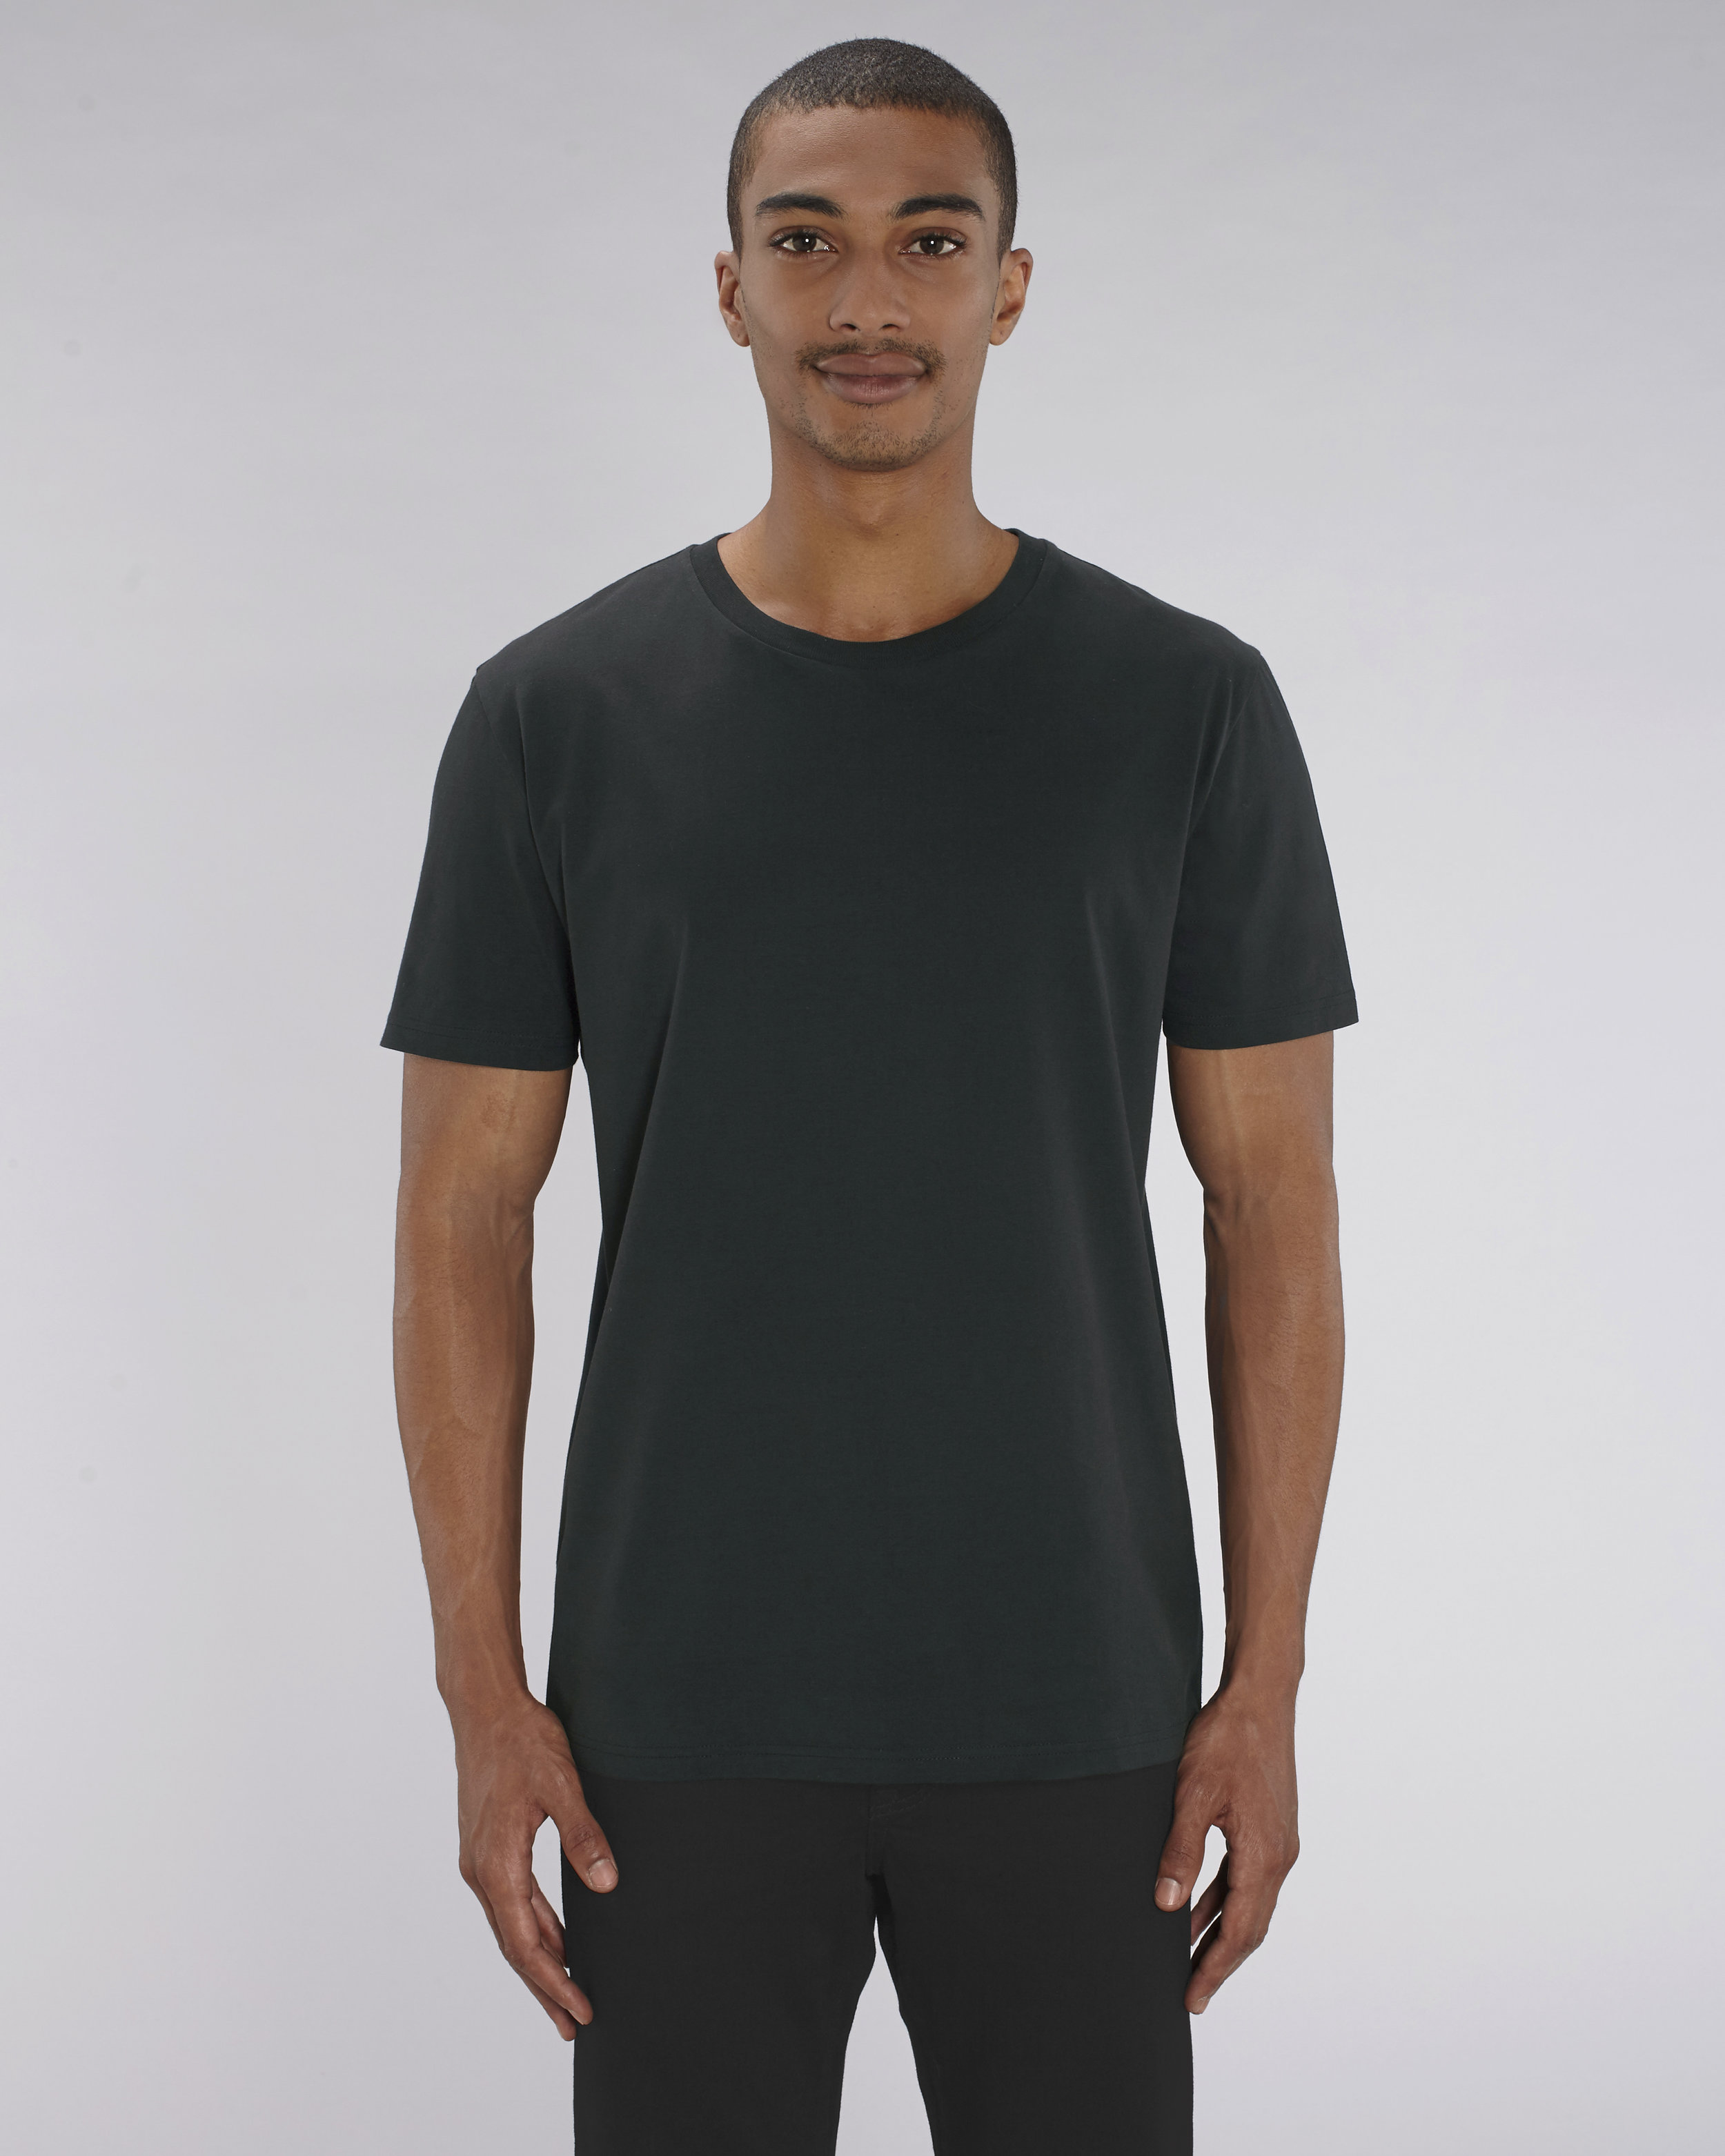 Stanley Stella Organic Creator T-shirt in Black